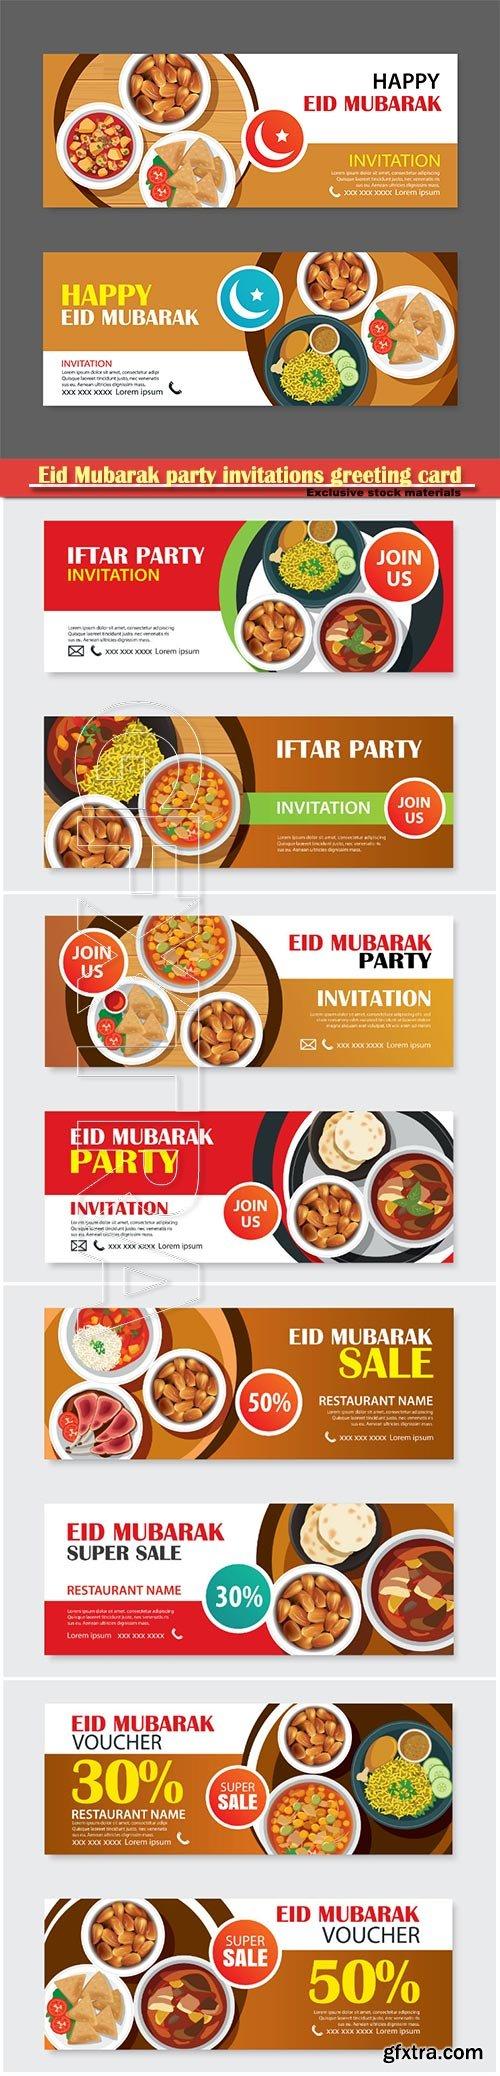 Eid Mubarak party invitations greeting card and banner with food background, Ramadan Kareem vector illustration